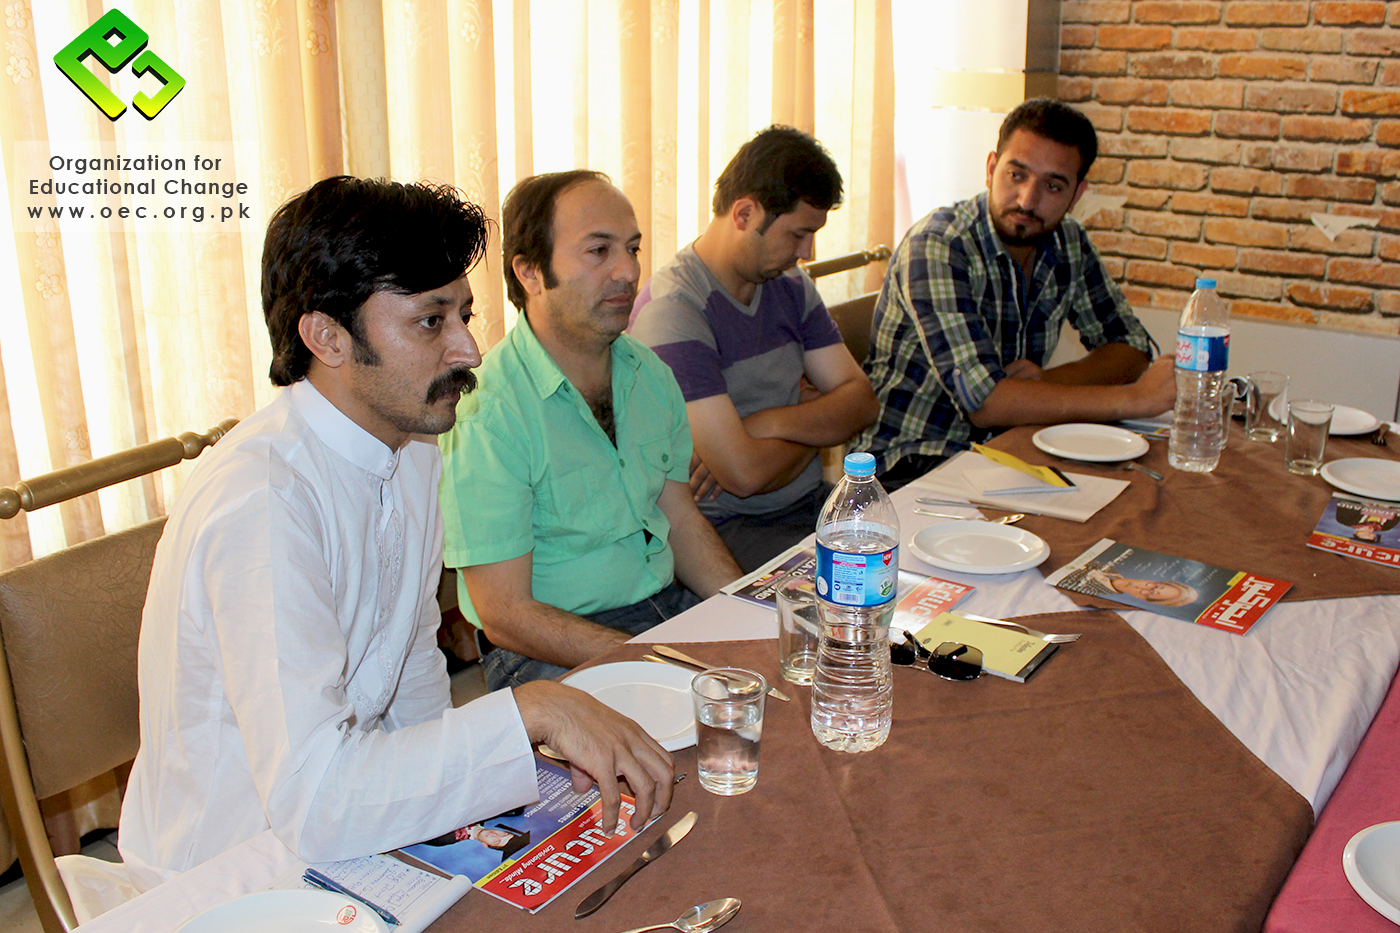 Kamil Jan Baigal, the founder of GBVM, expressing his views